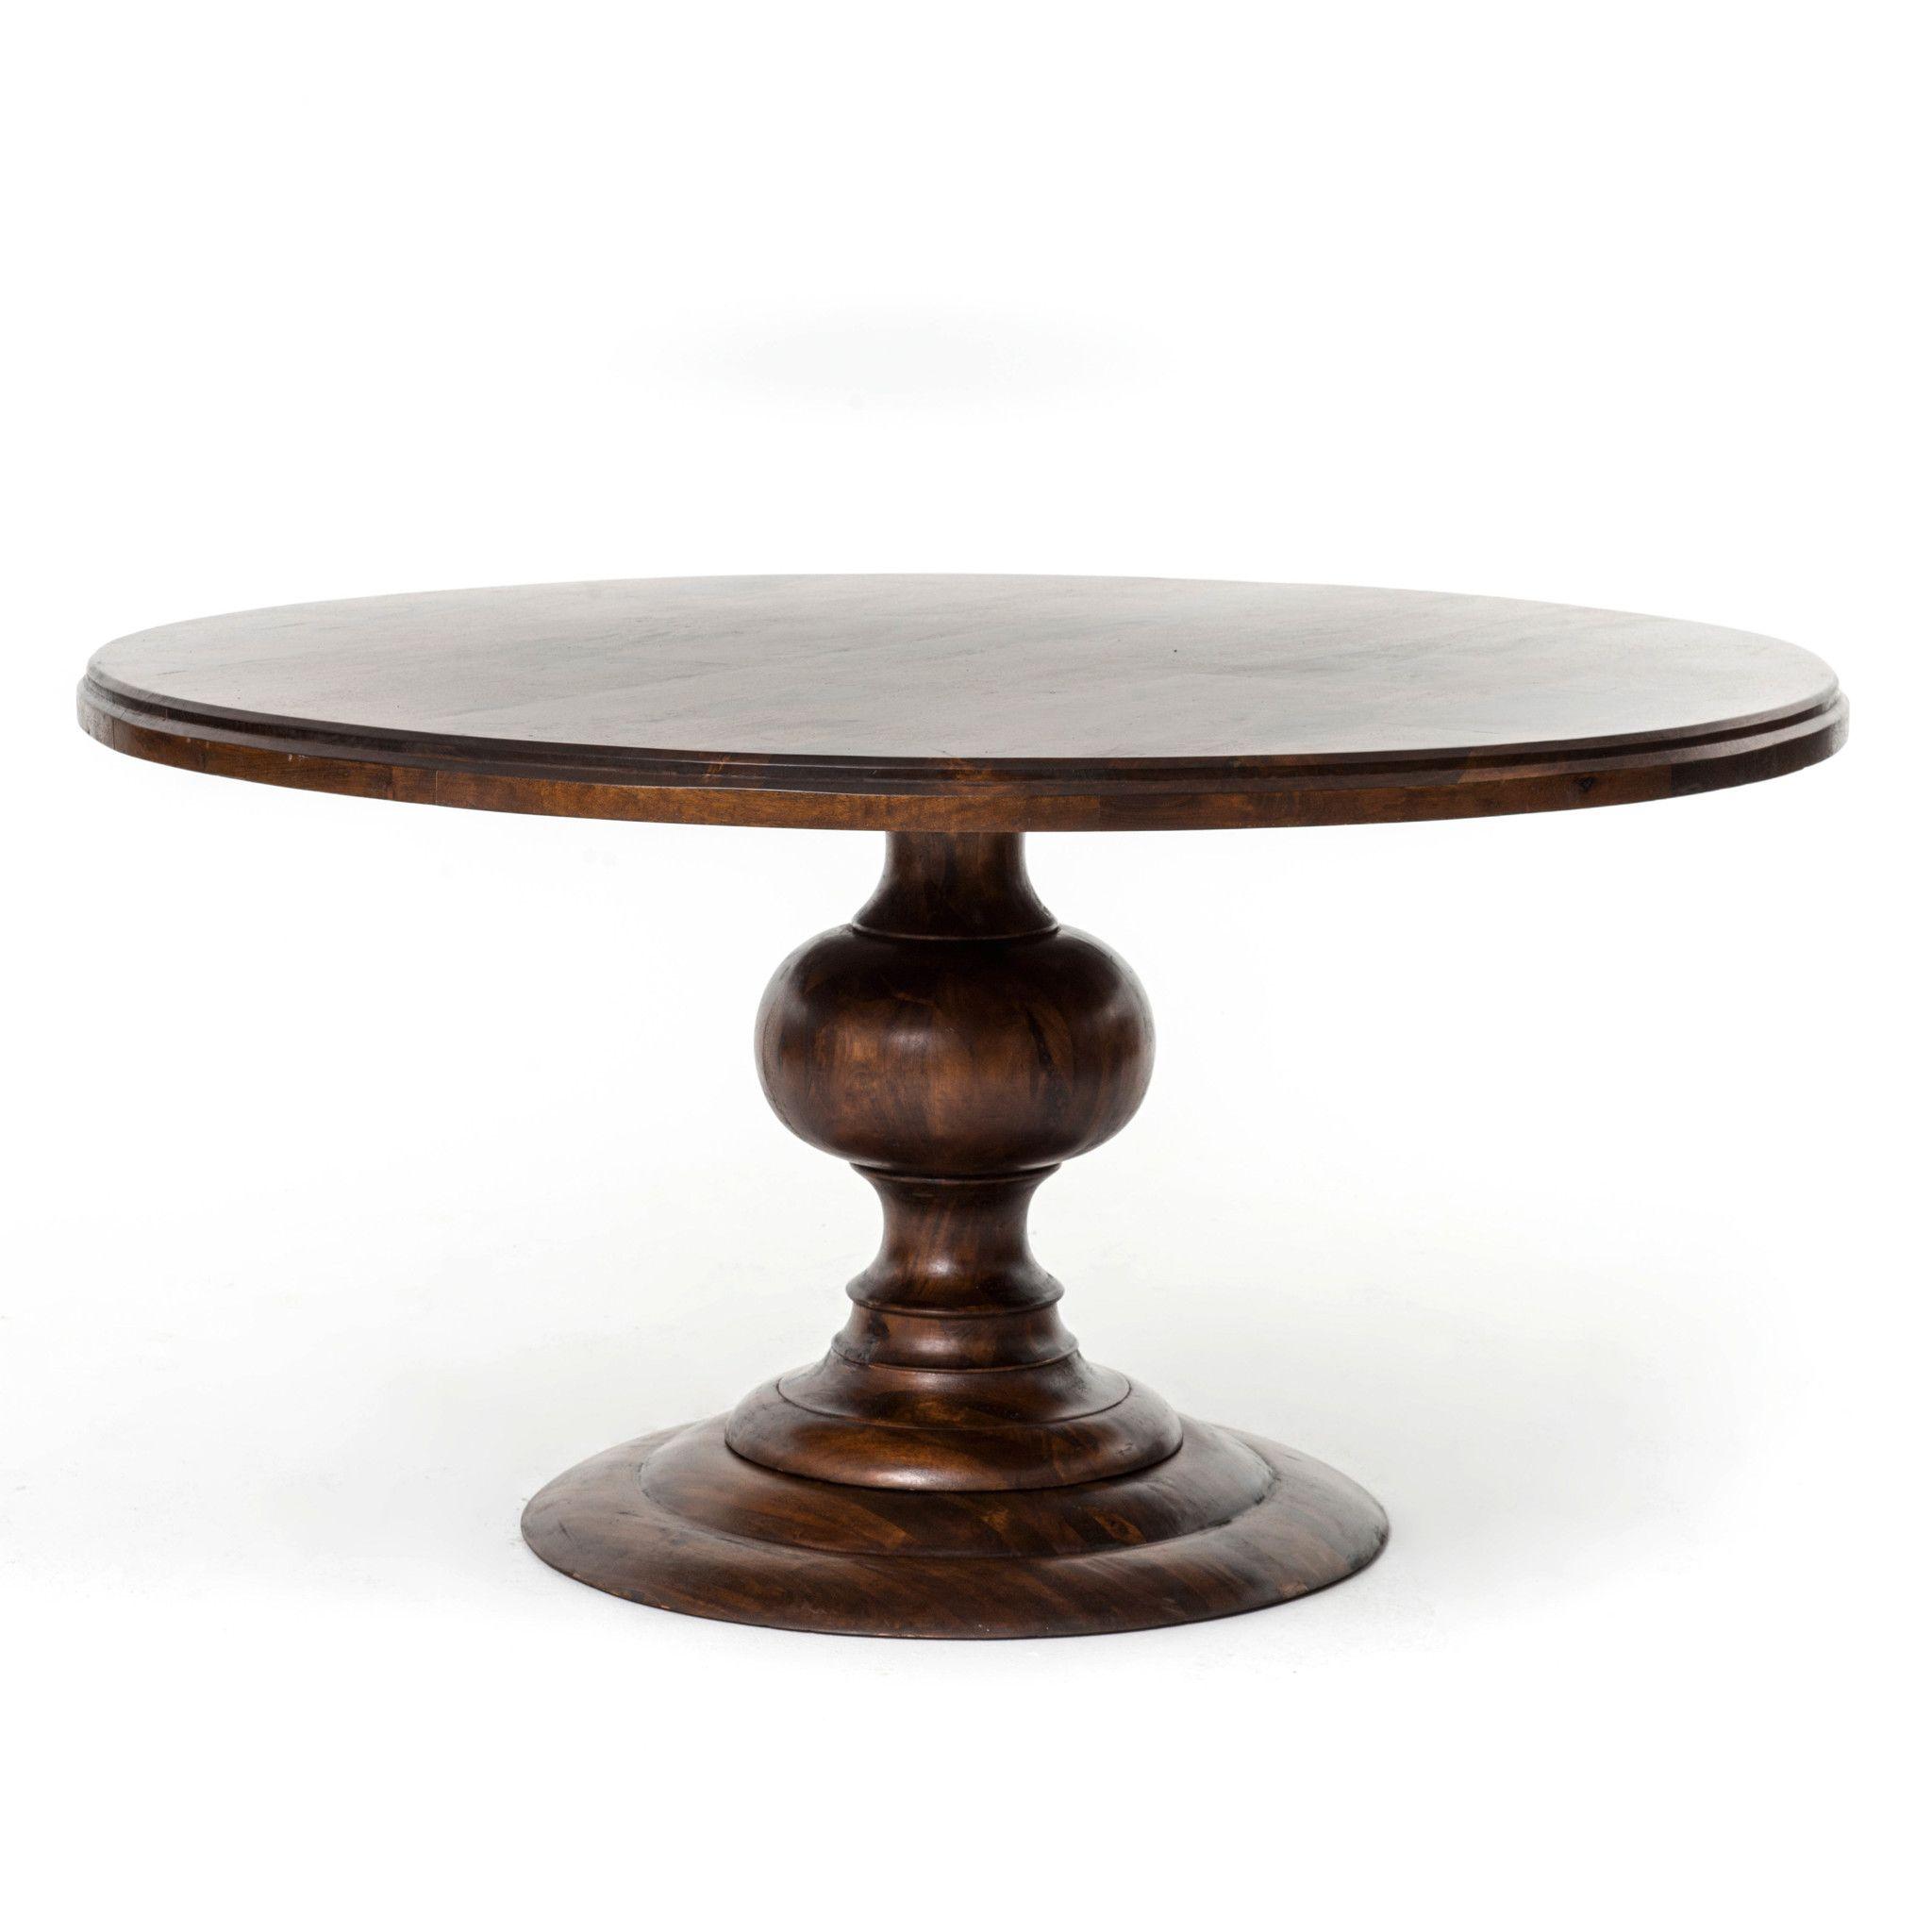 dcor design azalea dining table. dcor design azalea dining table  kitchen  pinterest  magnolia